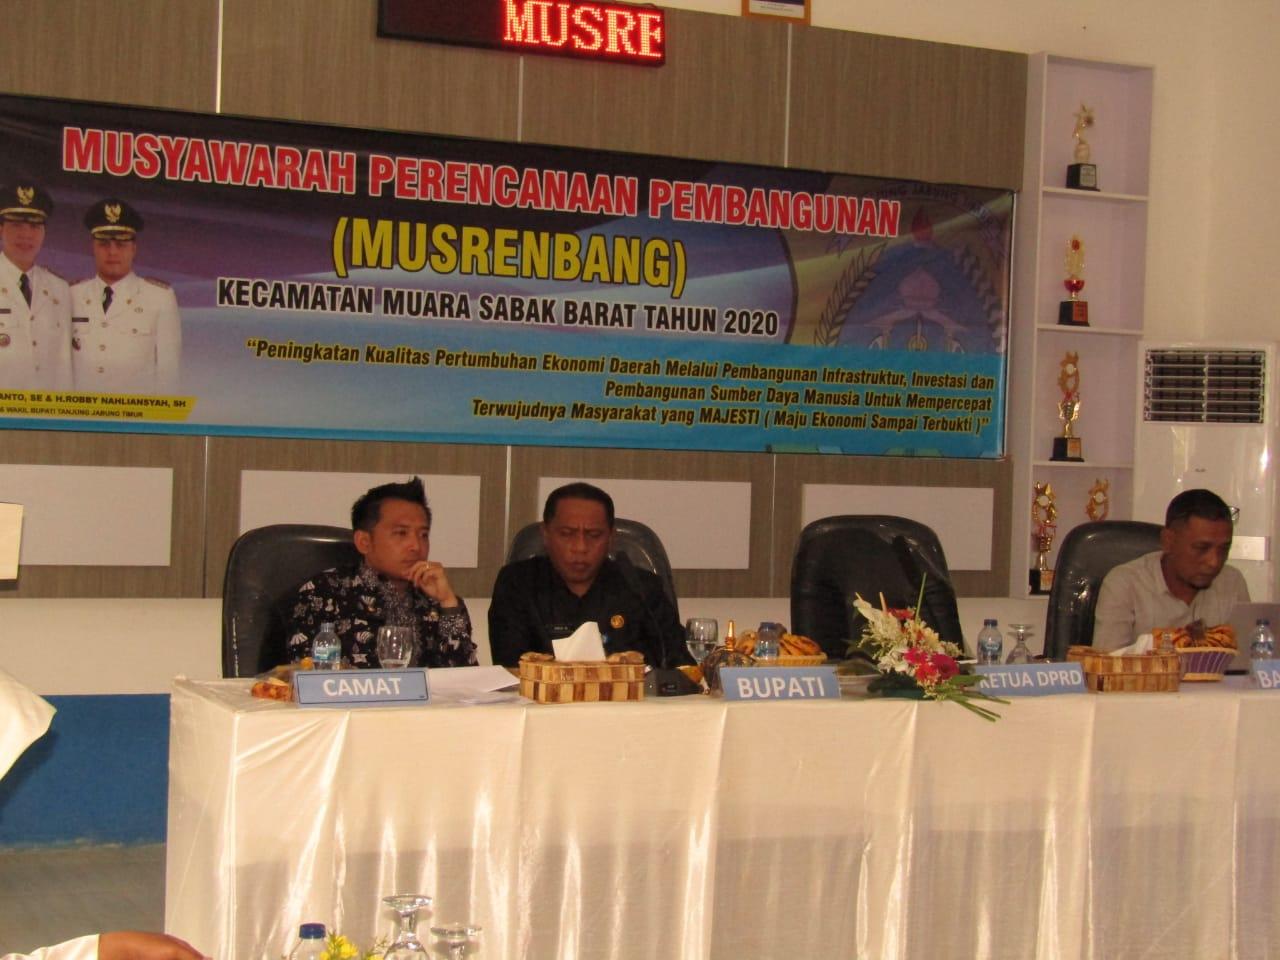 233 Usulan Jadi Prioritas Musrenbang Kecamatan Muara Sabak Barat